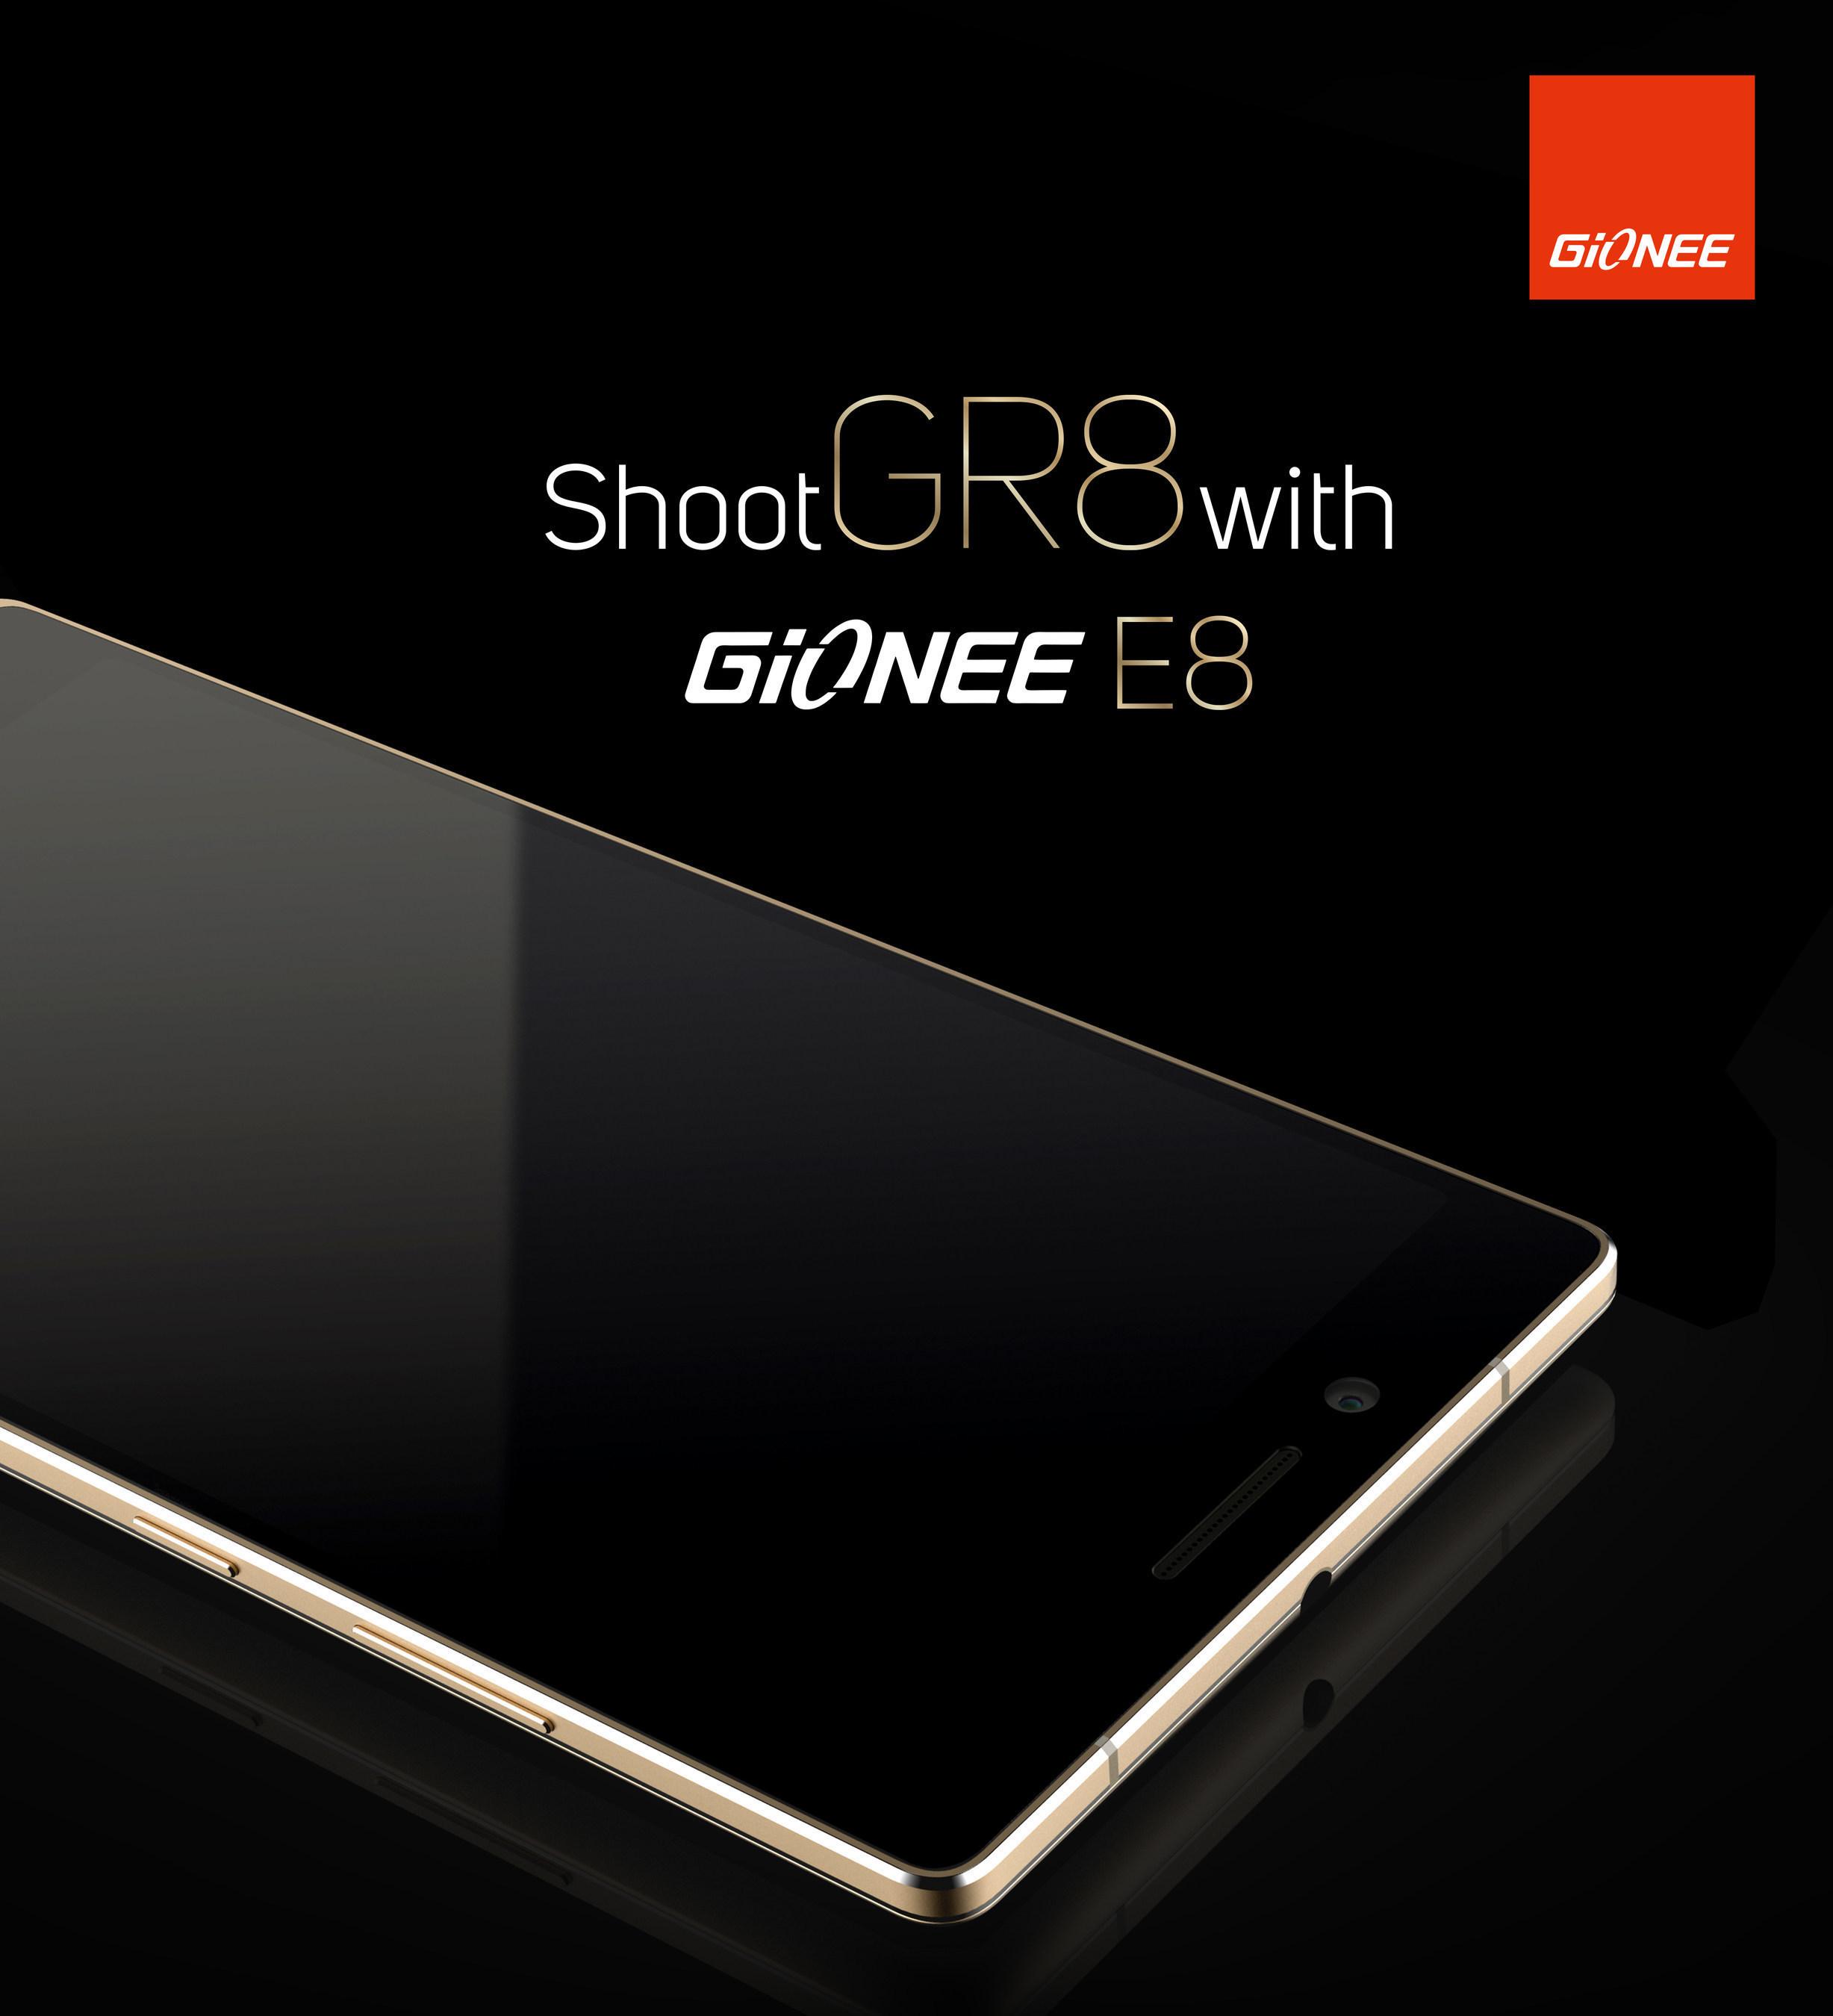 Gionee new flagship smartphone Elife E8